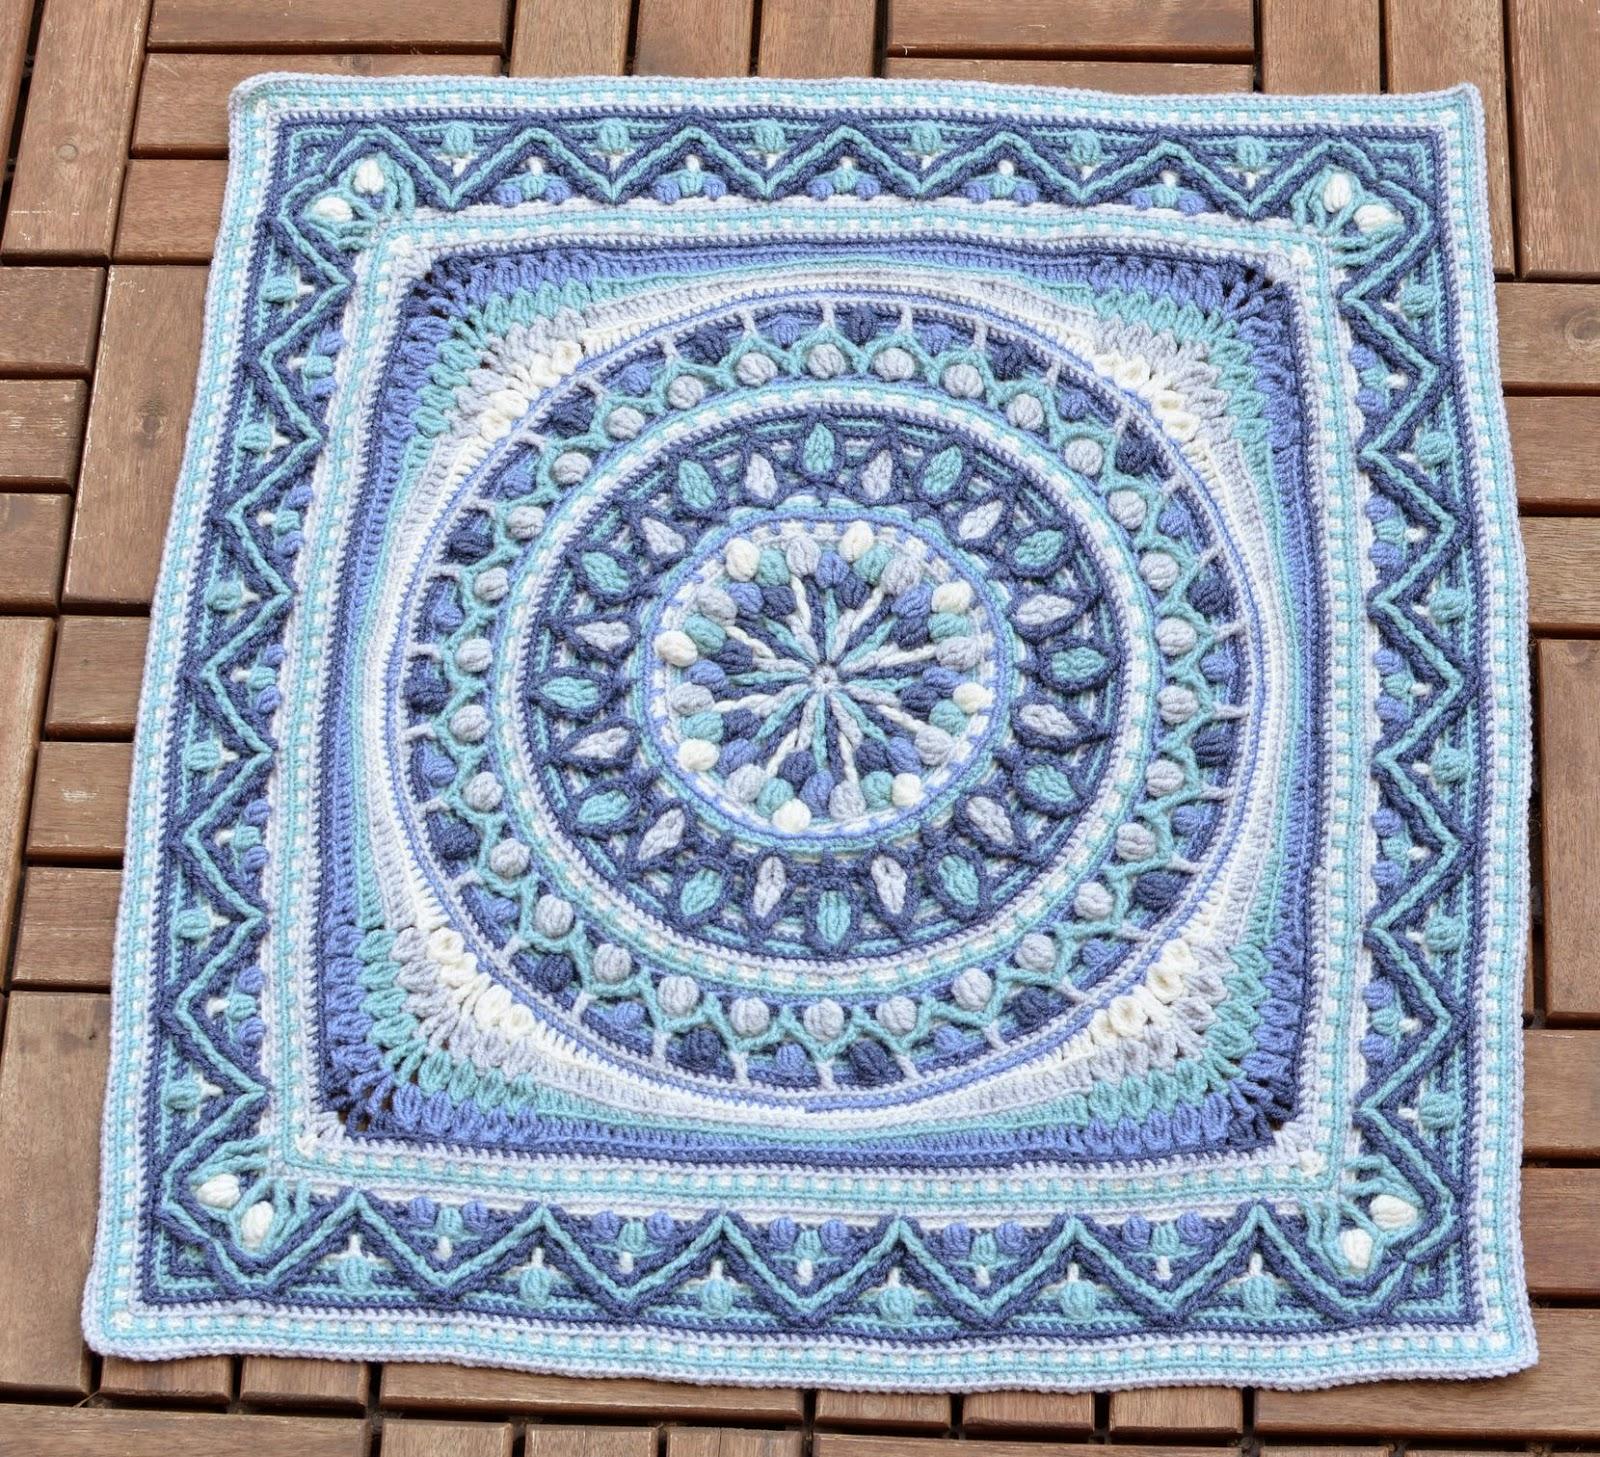 Crochet Patterns Using Mandala Yarn : ... mandalas so far the first one was designed using dk mix wool yarn in